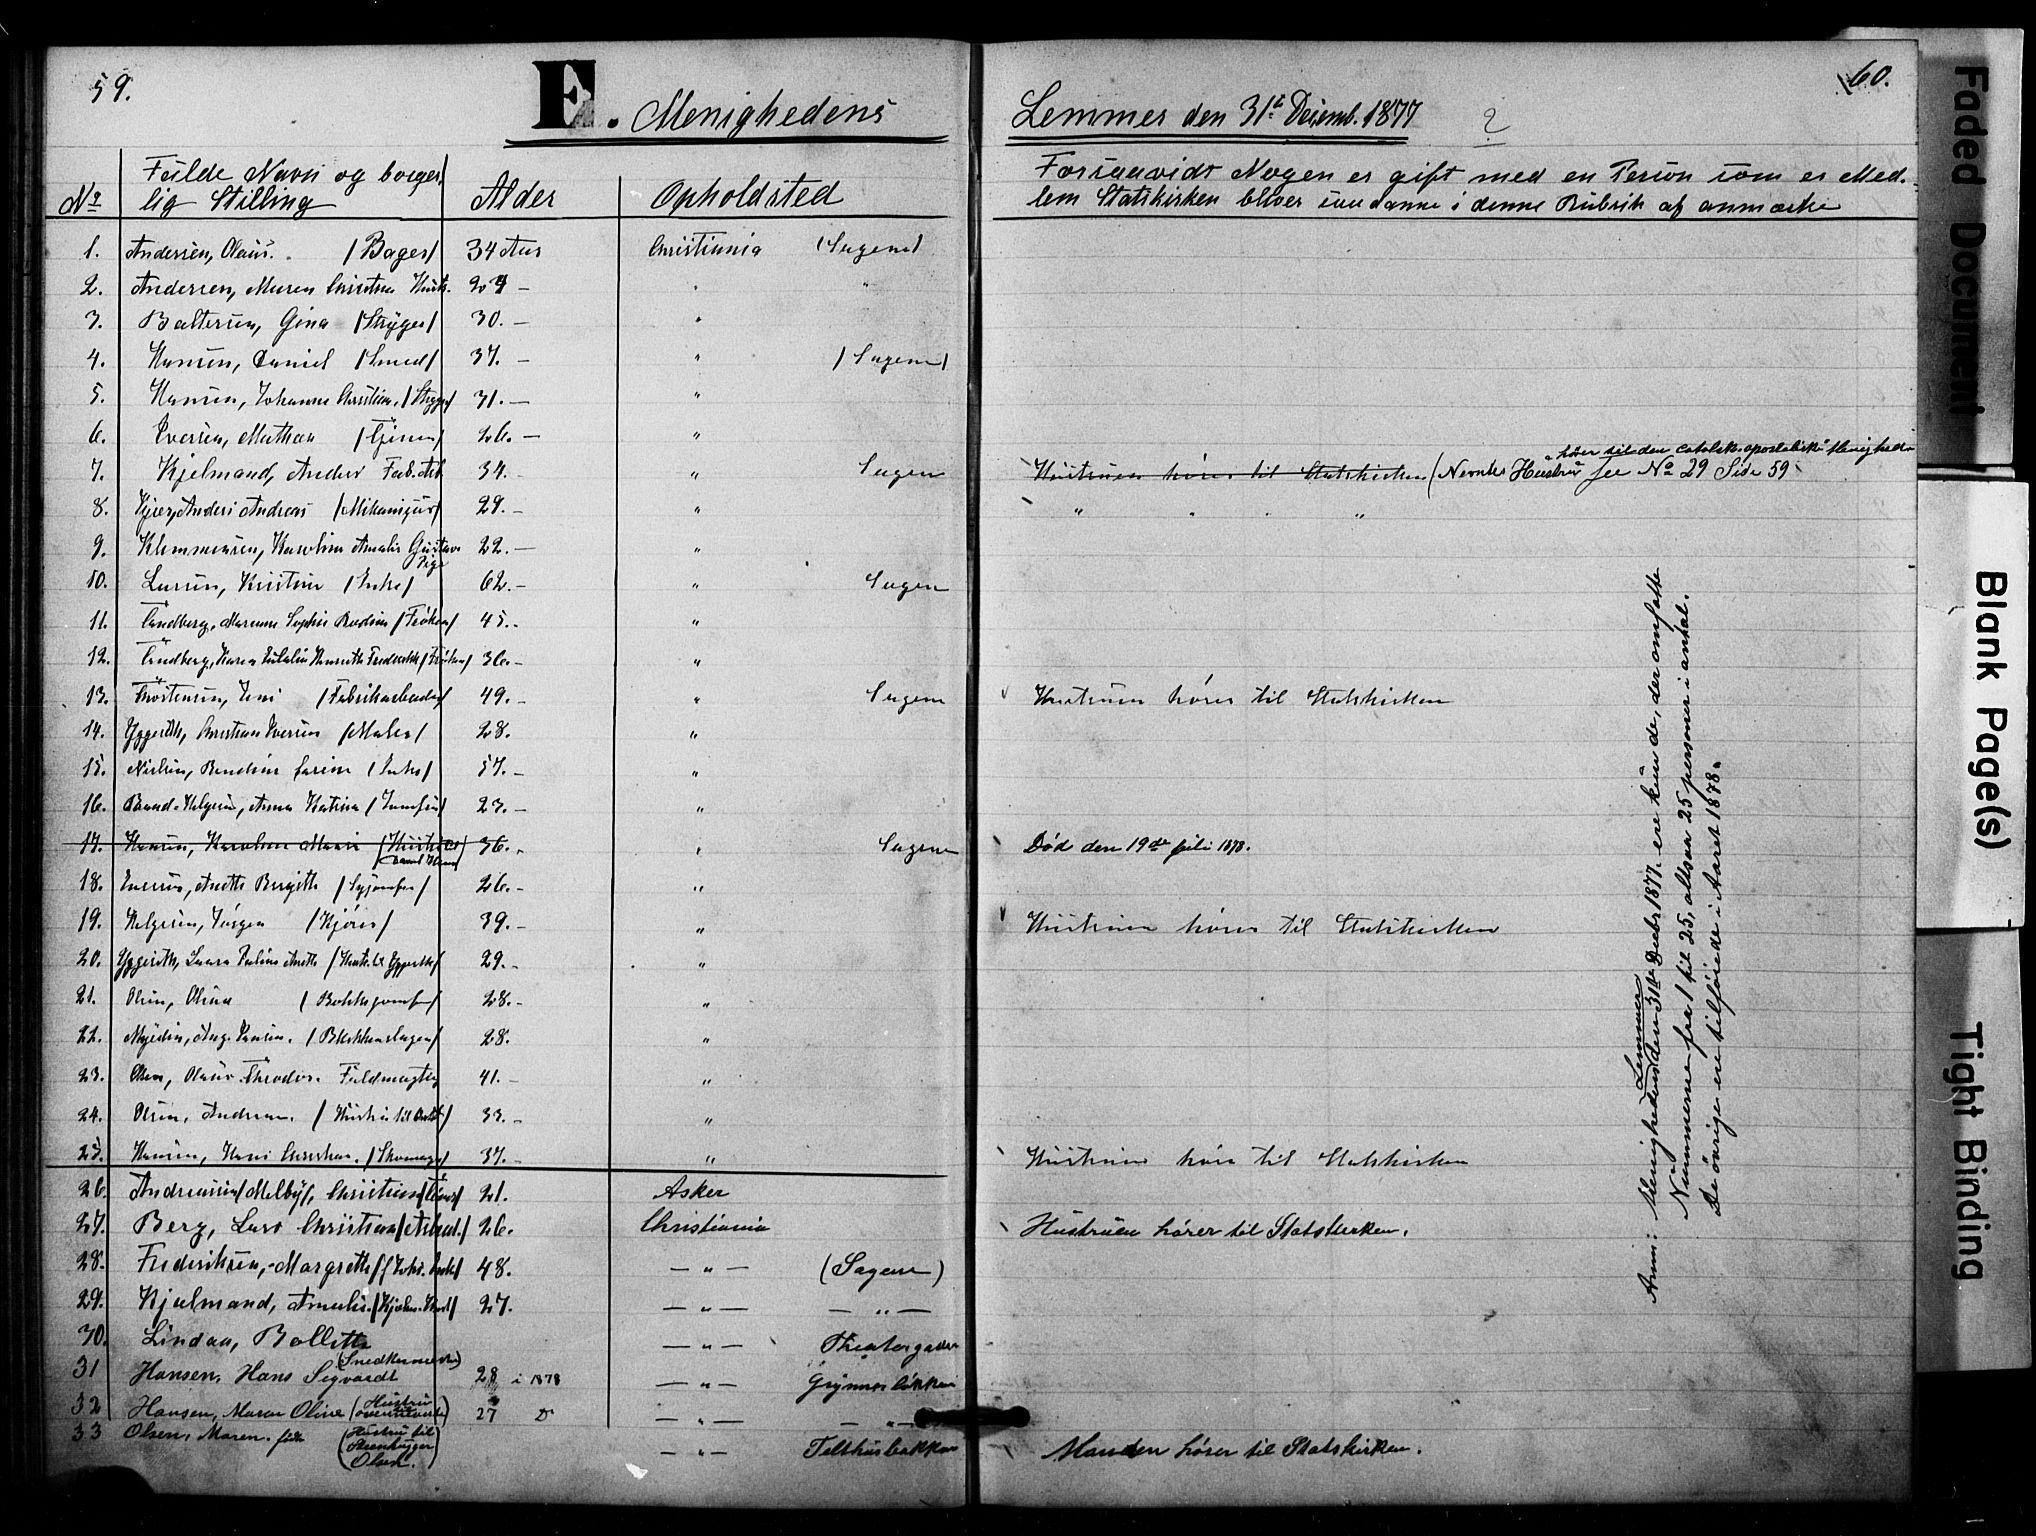 SAO, Den katolsk apostoliske menighet i Oslo , F/Fa/L0001: Dissenterprotokoll nr. 1, 1877-1891, s. 59-60